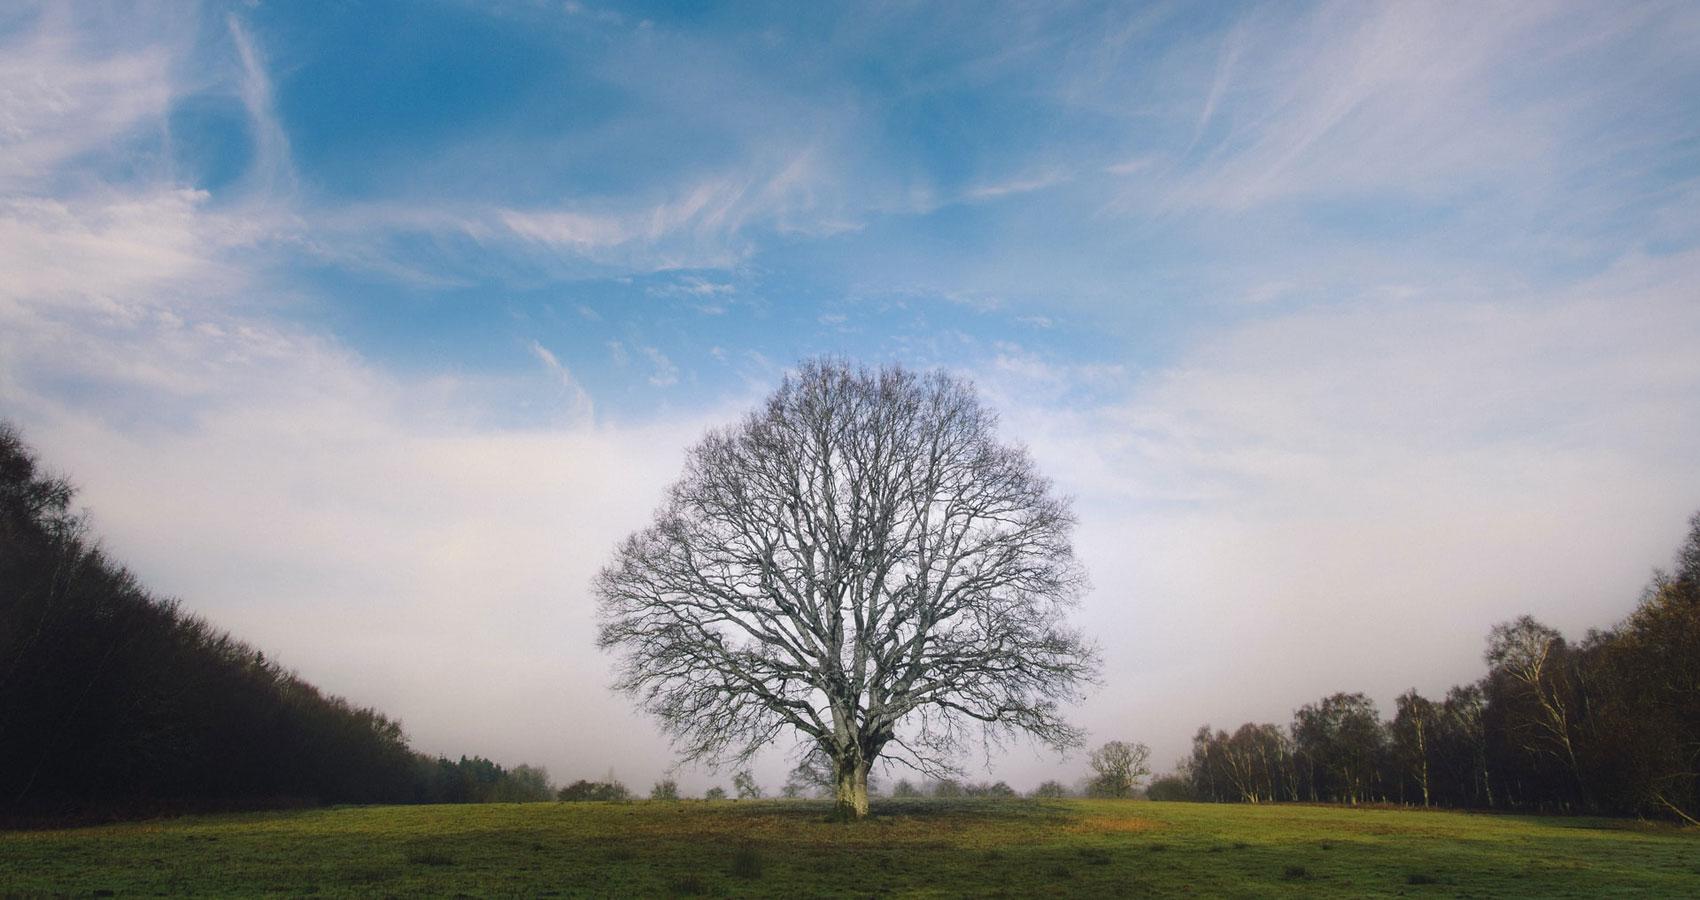 Trees, a poem written by Joyce Kilmer at Spillwords.com